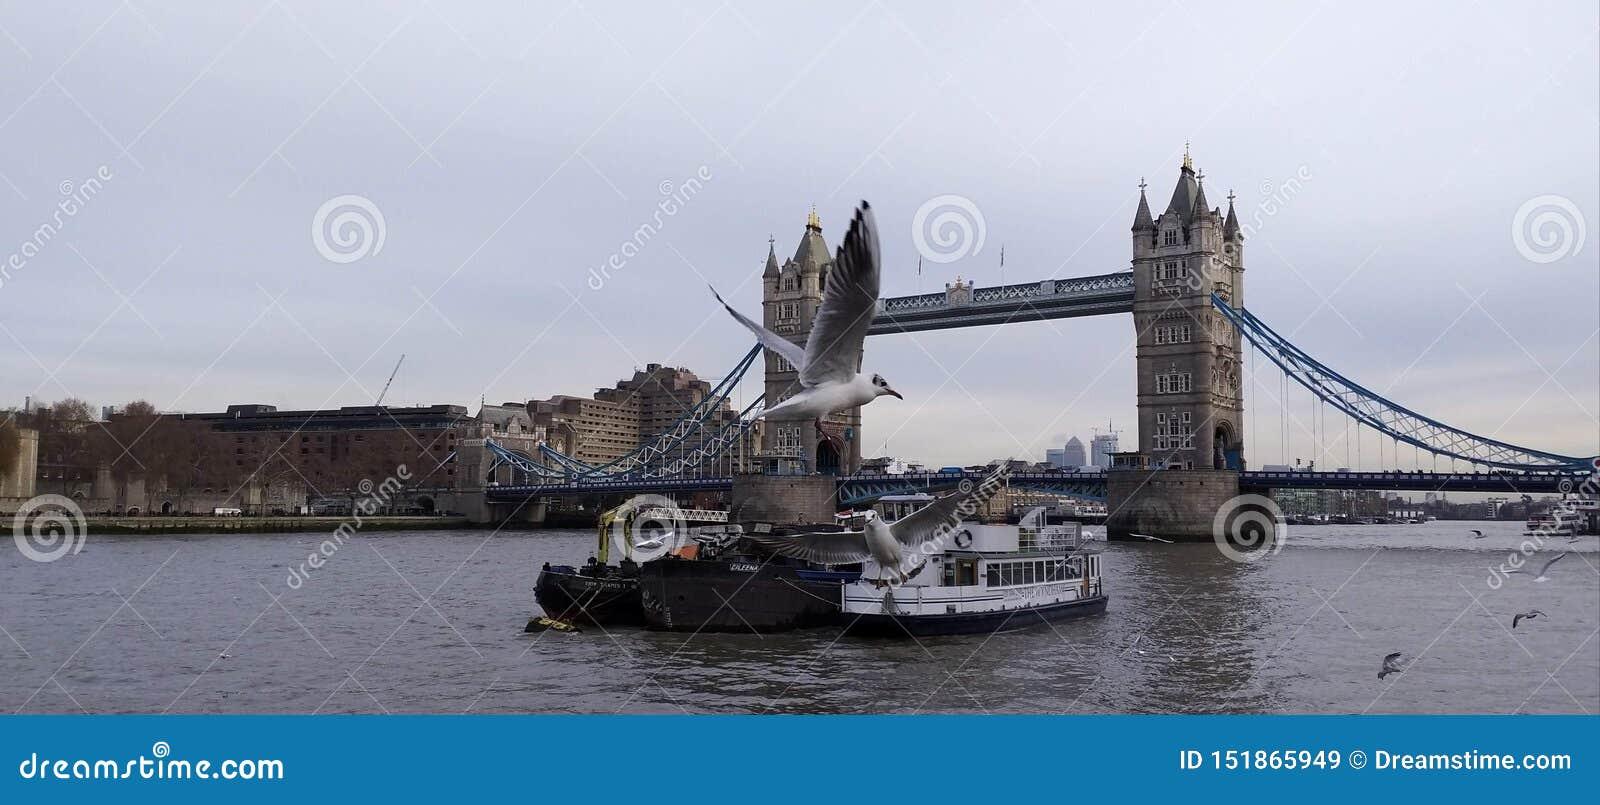 Die Seemöwen, die über die Turmbrücke fliegen